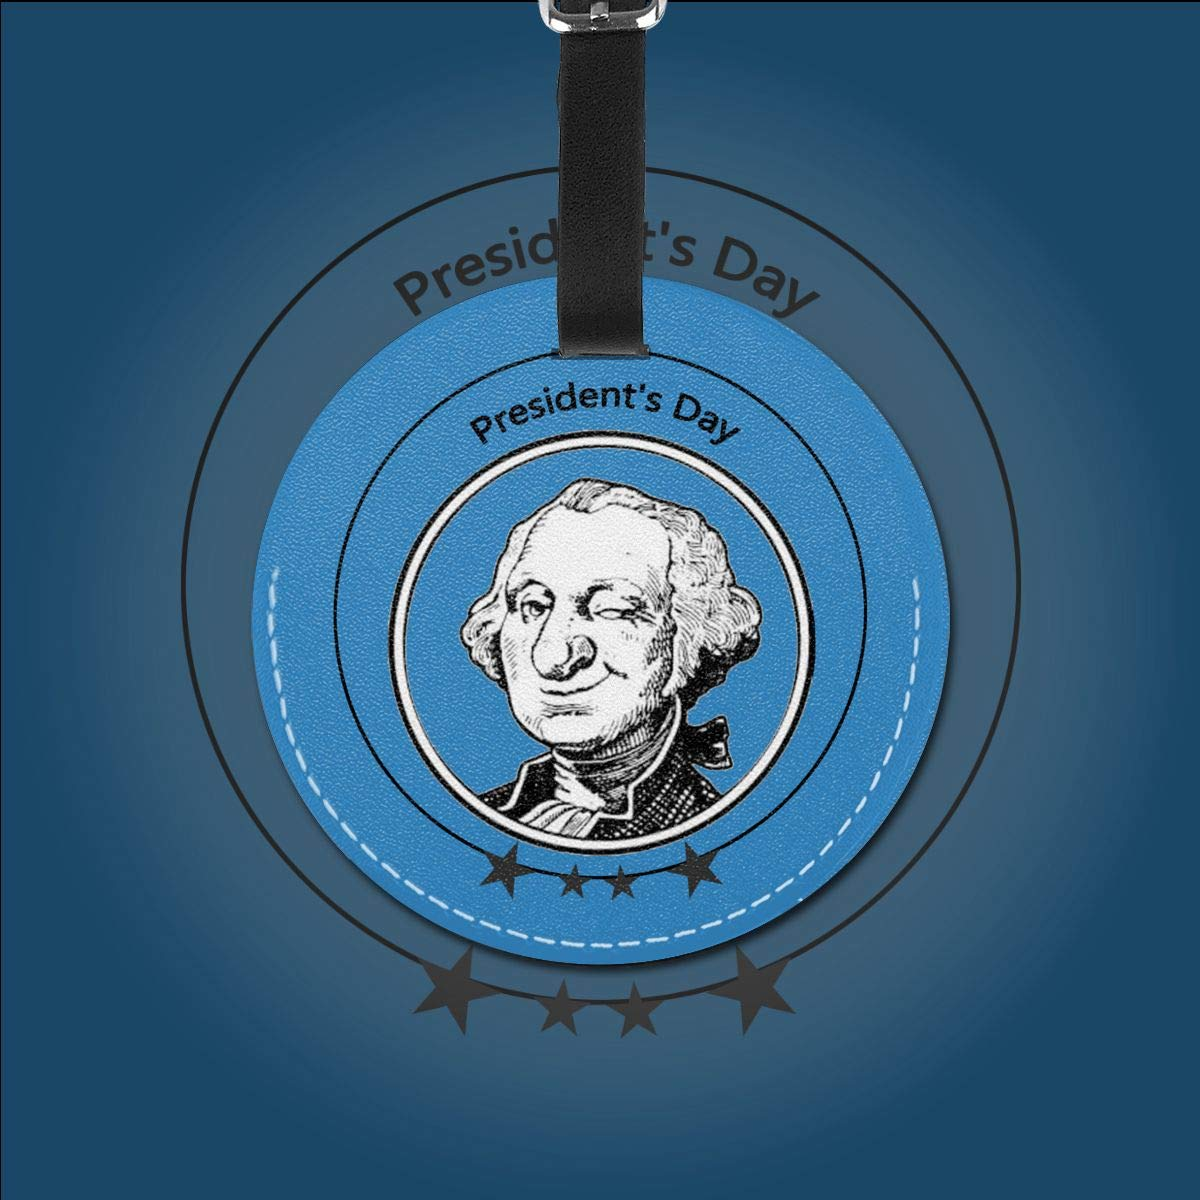 1pcs,2pcs,4pcs Washington Saying 1st Presidents Day Pu Leather Double Sides Print Round Luggage Tag Mutilple Packs